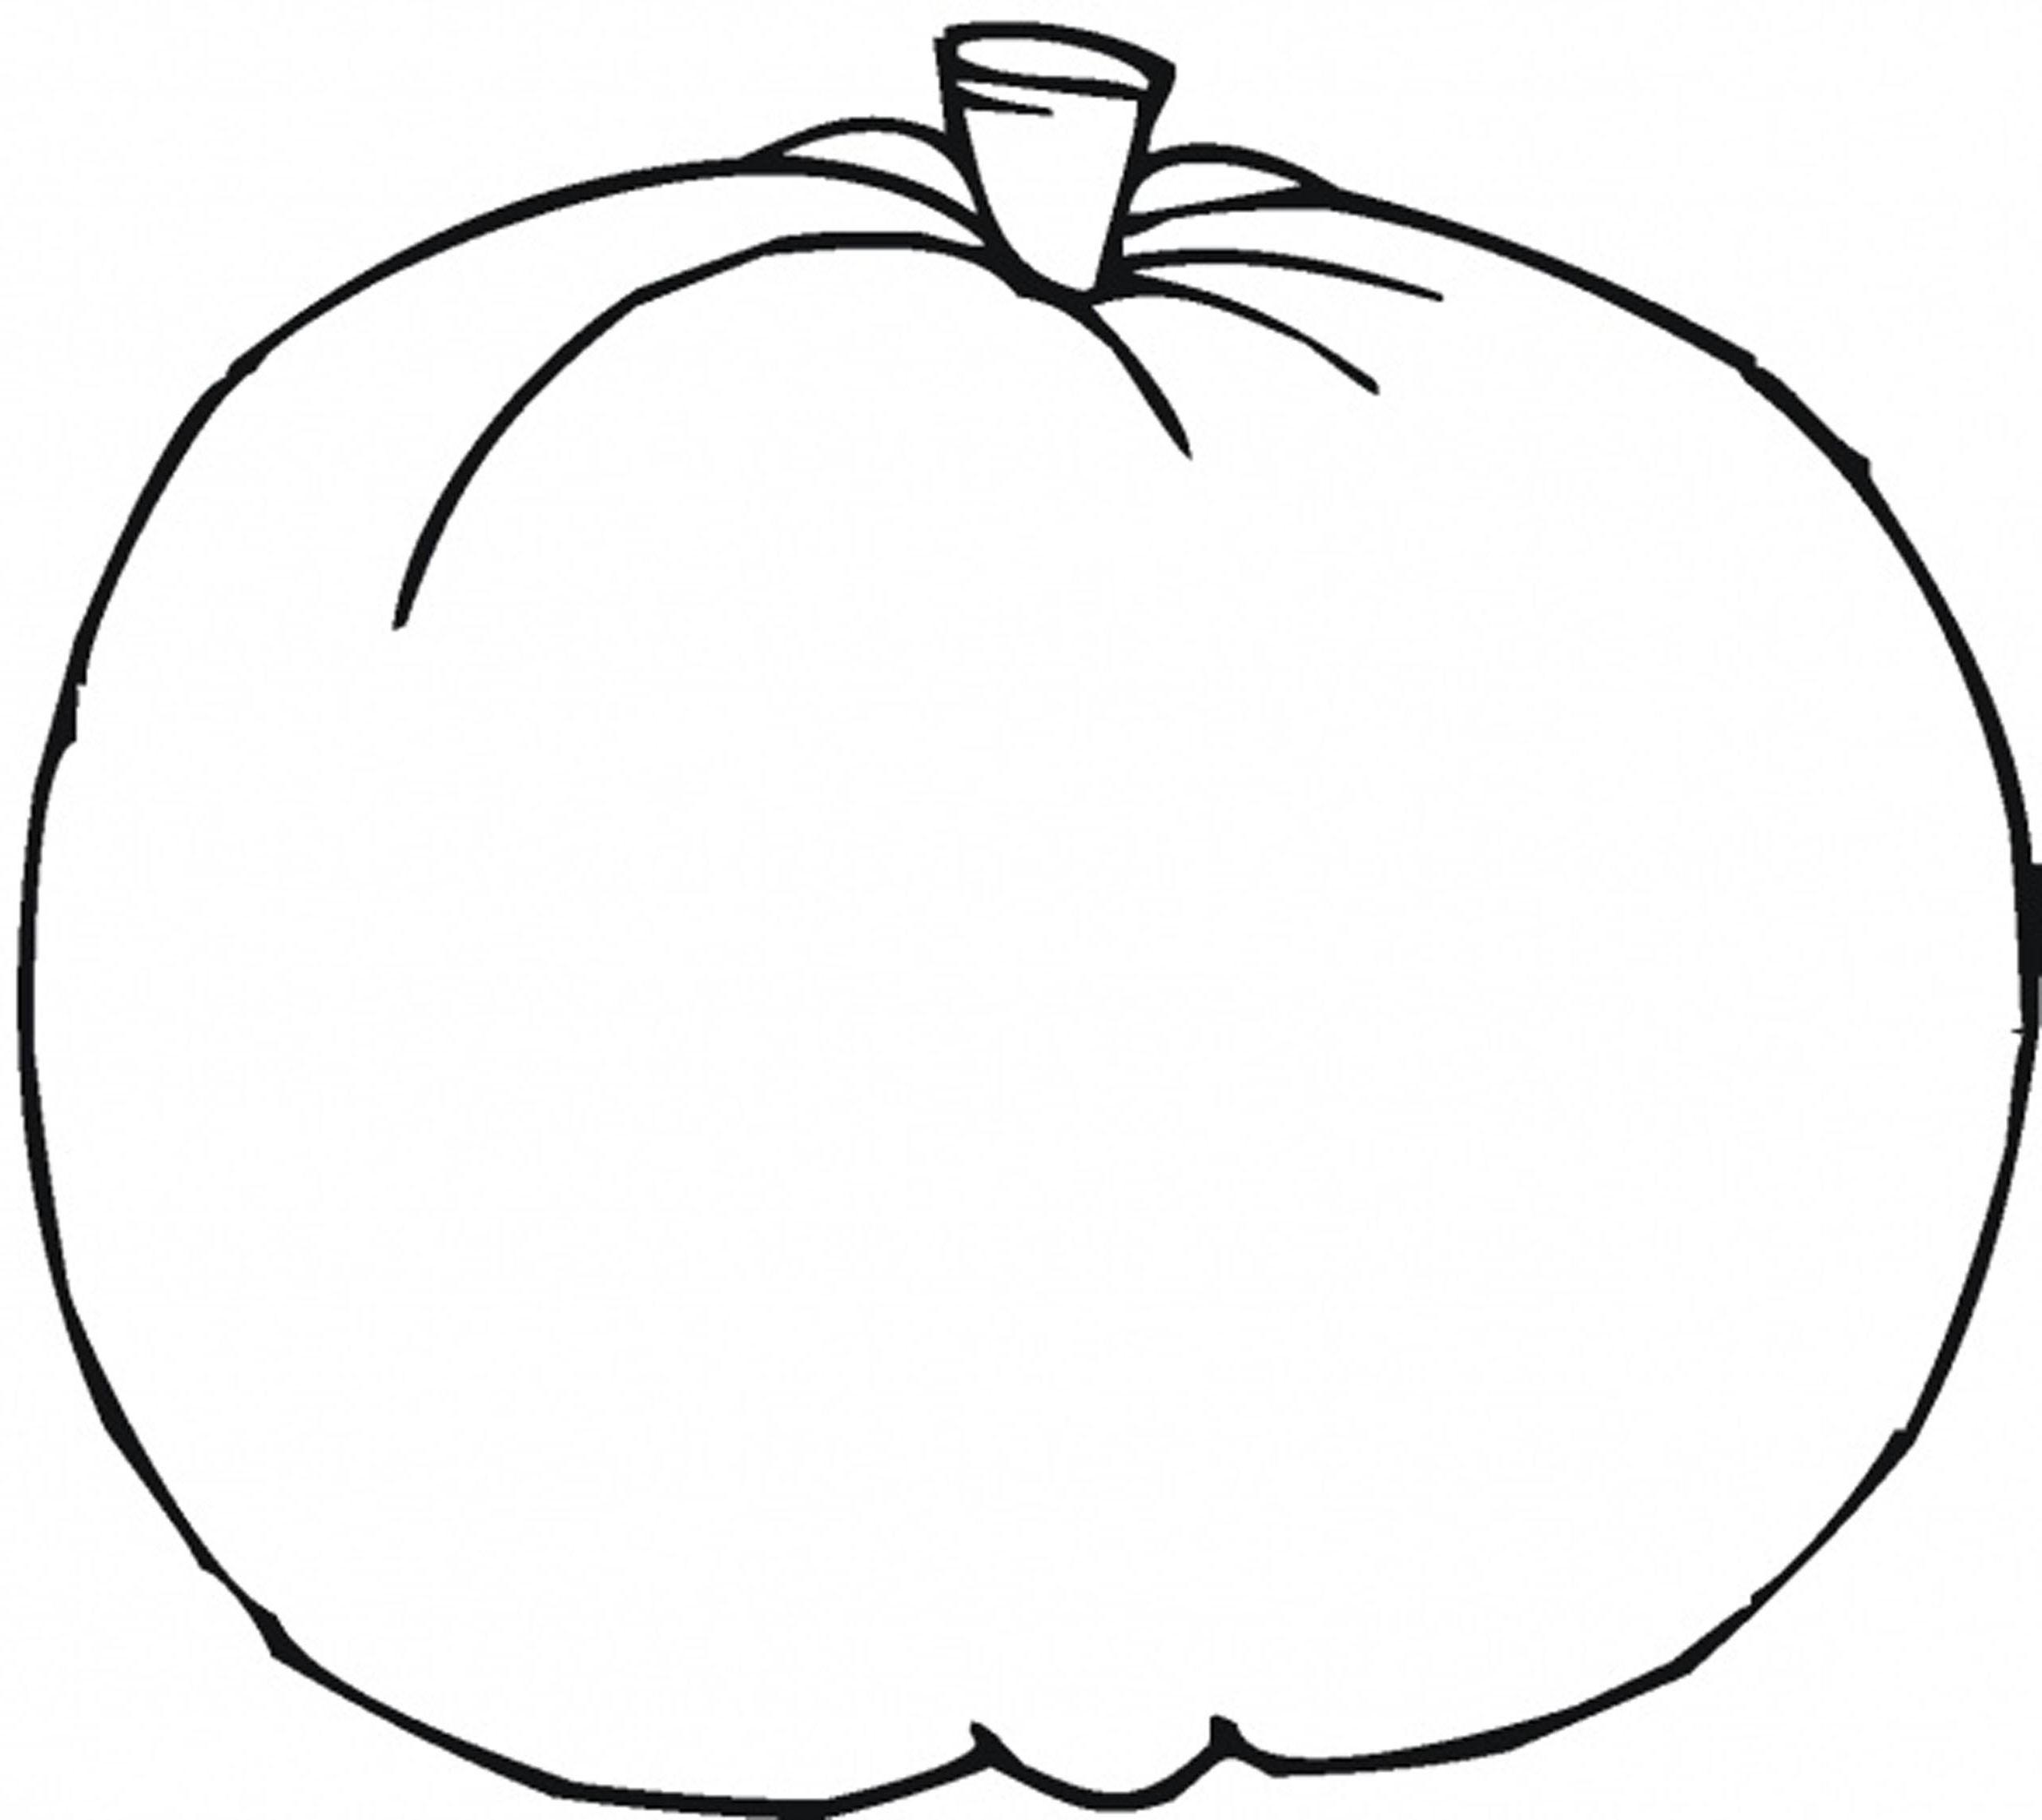 Simple Pumpkin Drawing At Getdrawings